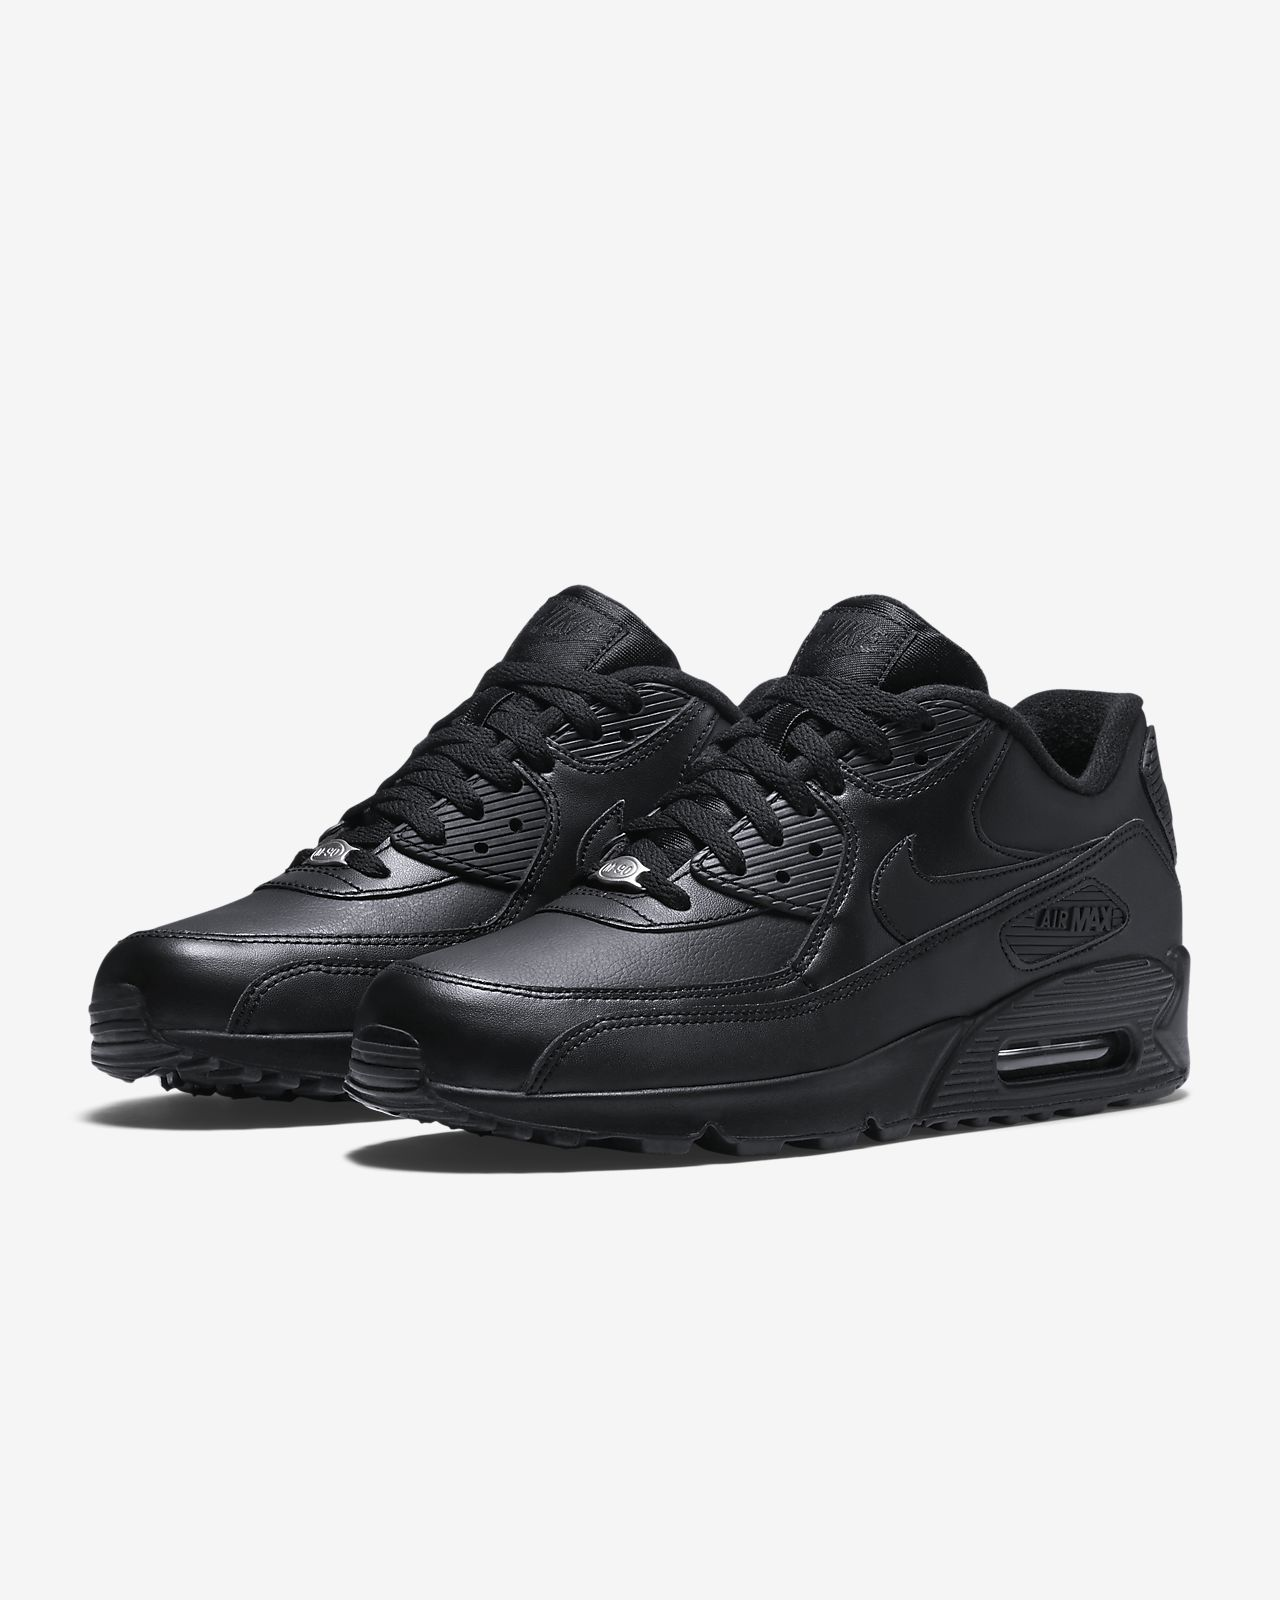 online store 44736 ec5bd ... Nike Air Max 90 Leather Zapatillas - Hombre